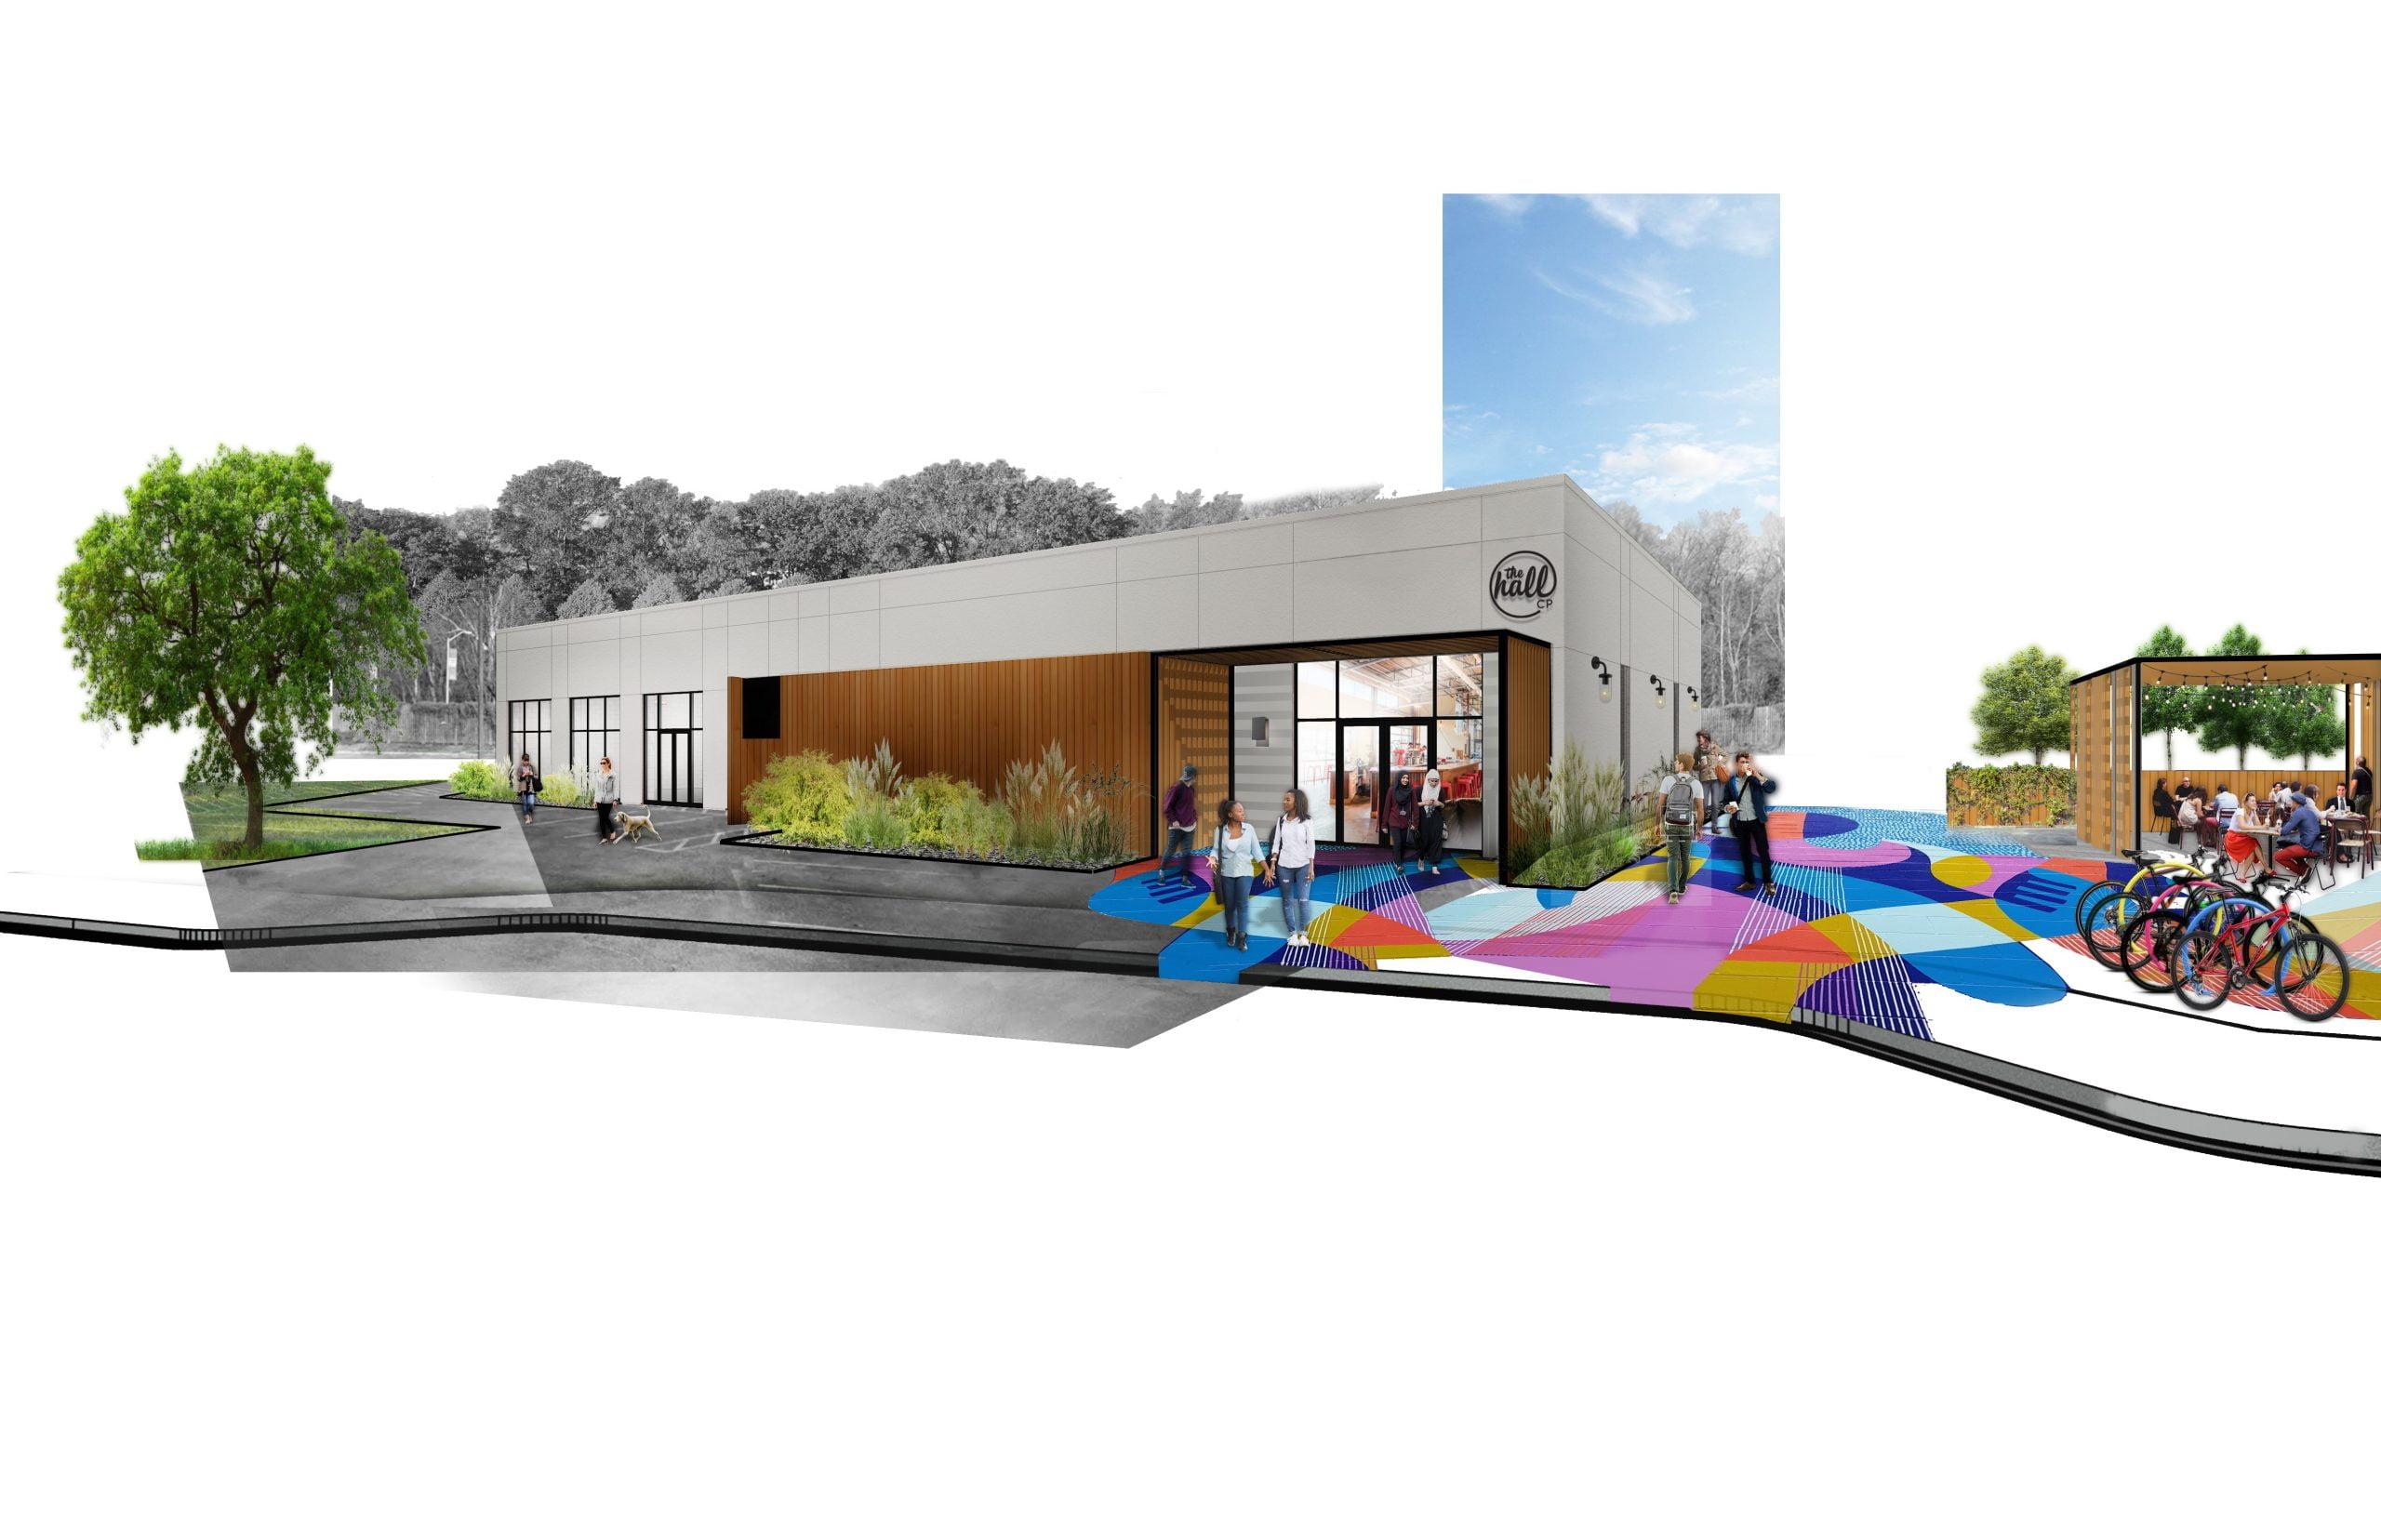 The Hall CP Scott Plank Rendering Design Exterior